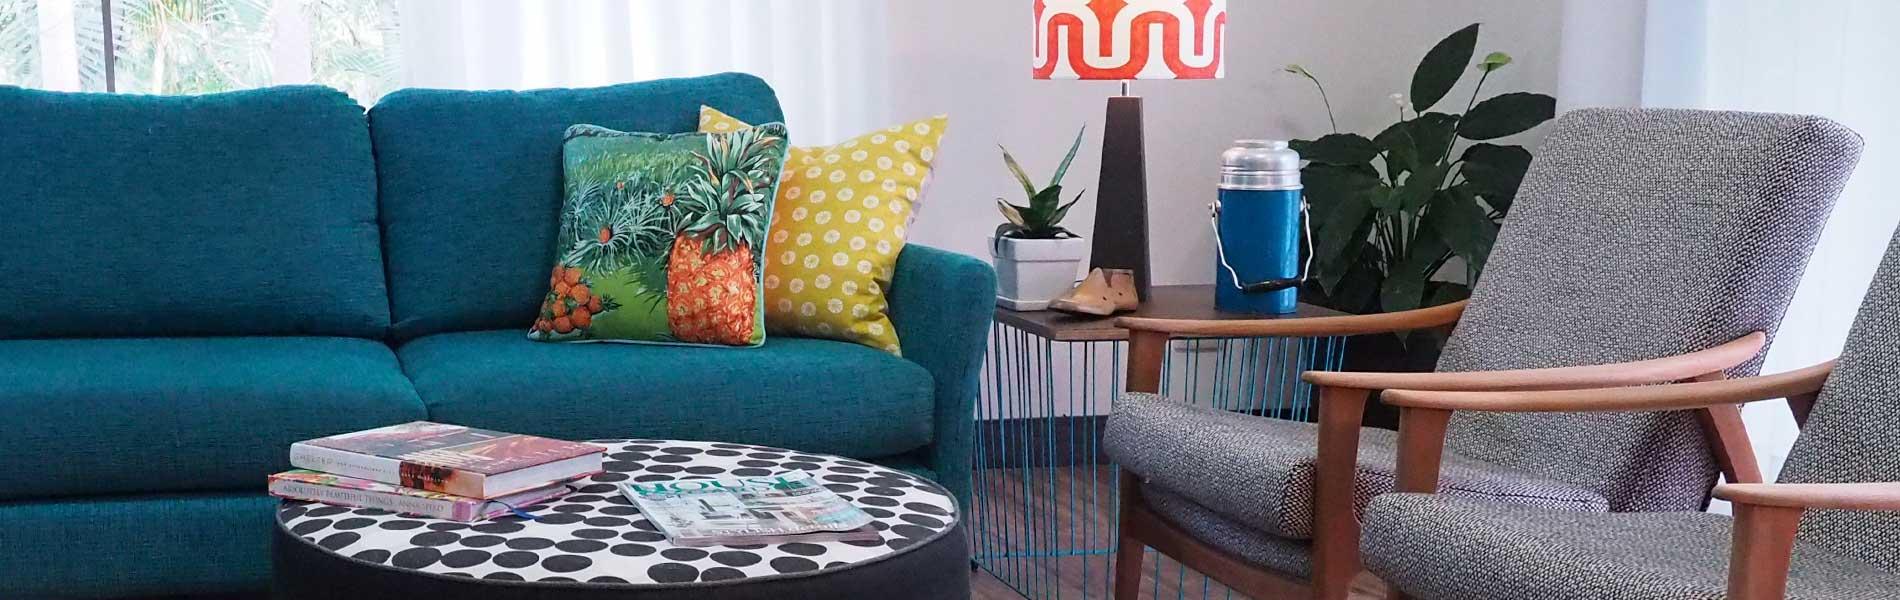 Custom Made beautiful furnishings